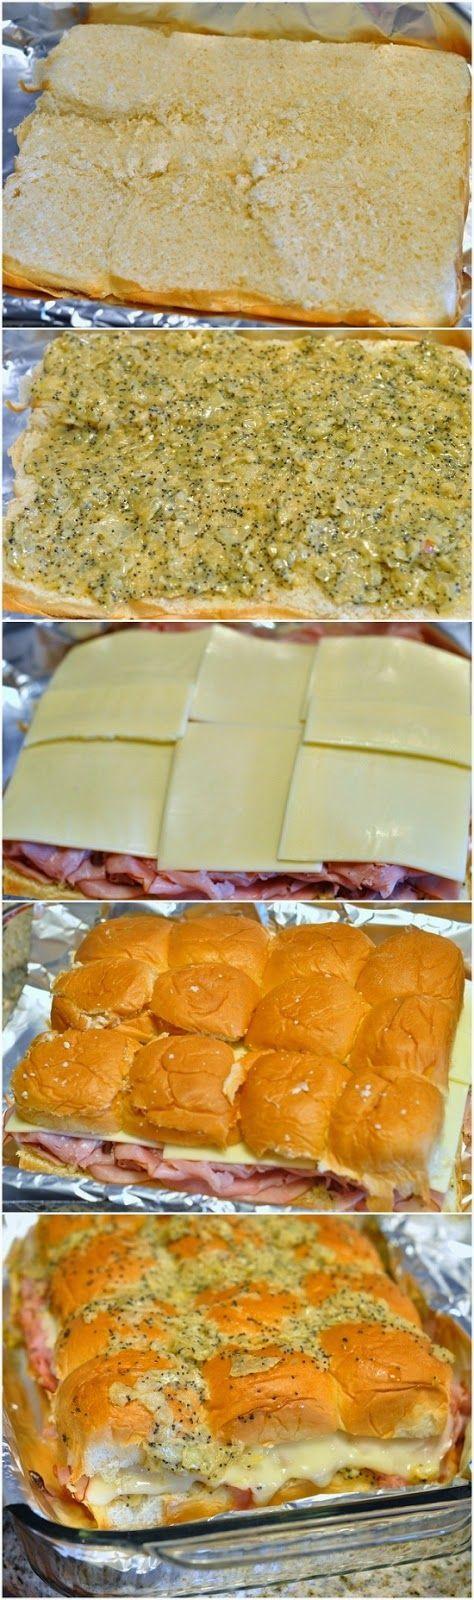 Amazing Stuffz: Mini poppy seed ham sandwiches on hawaiian sweet rolls